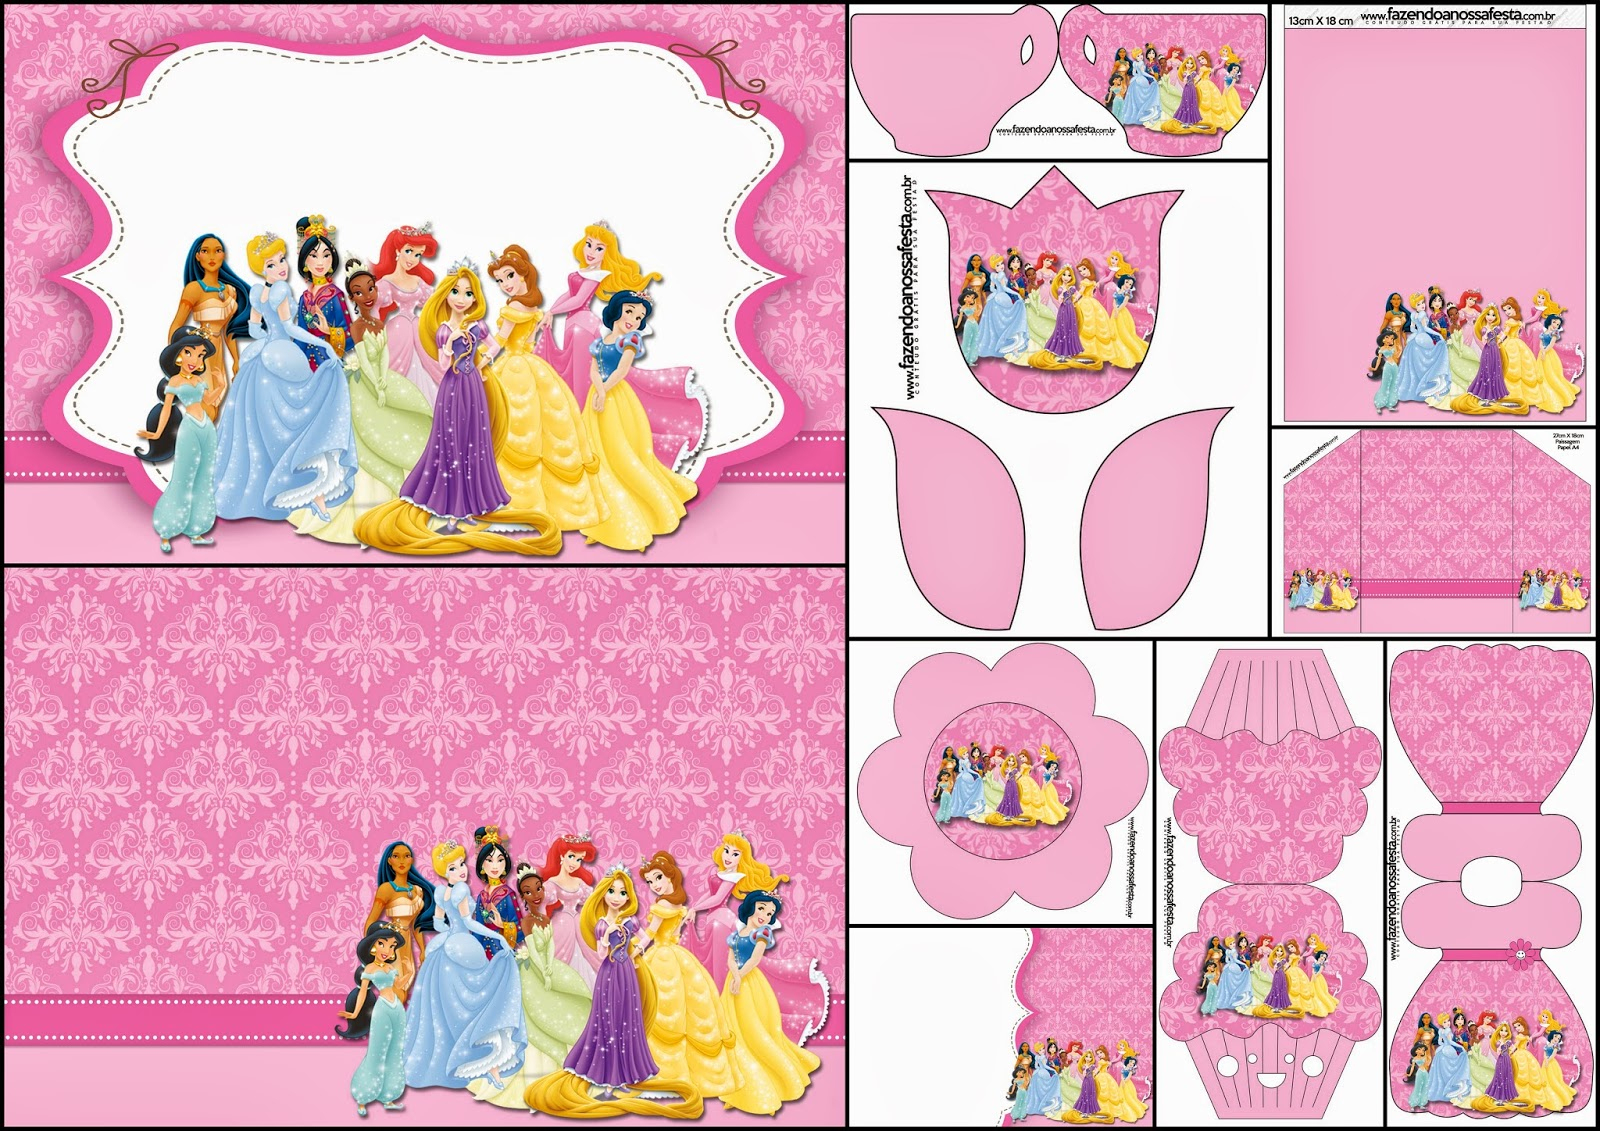 Disney Princess Party: Free Printable Party Invitations. | Oh My - Disney Princess Birthday Invitations Free Printable